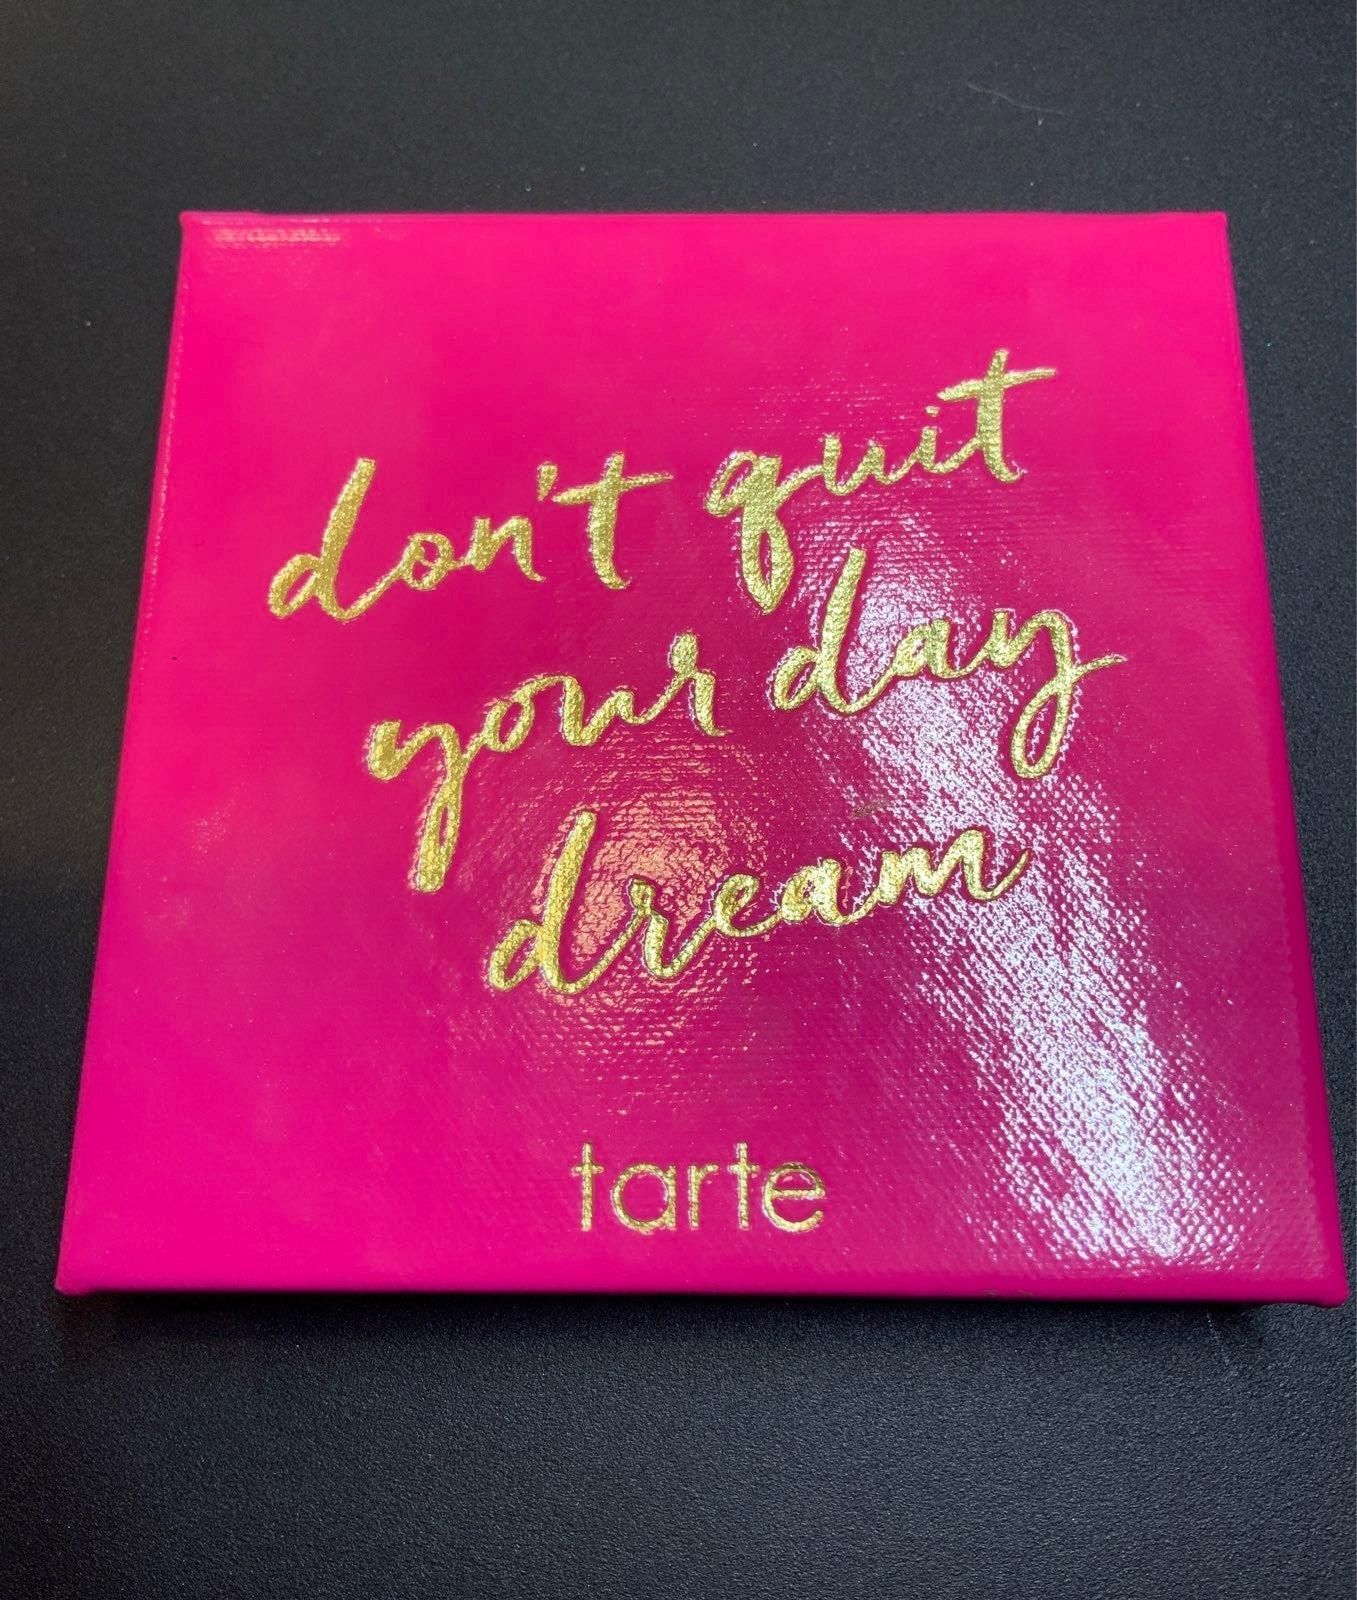 TARTE LE - Don't Quit Your Day Job